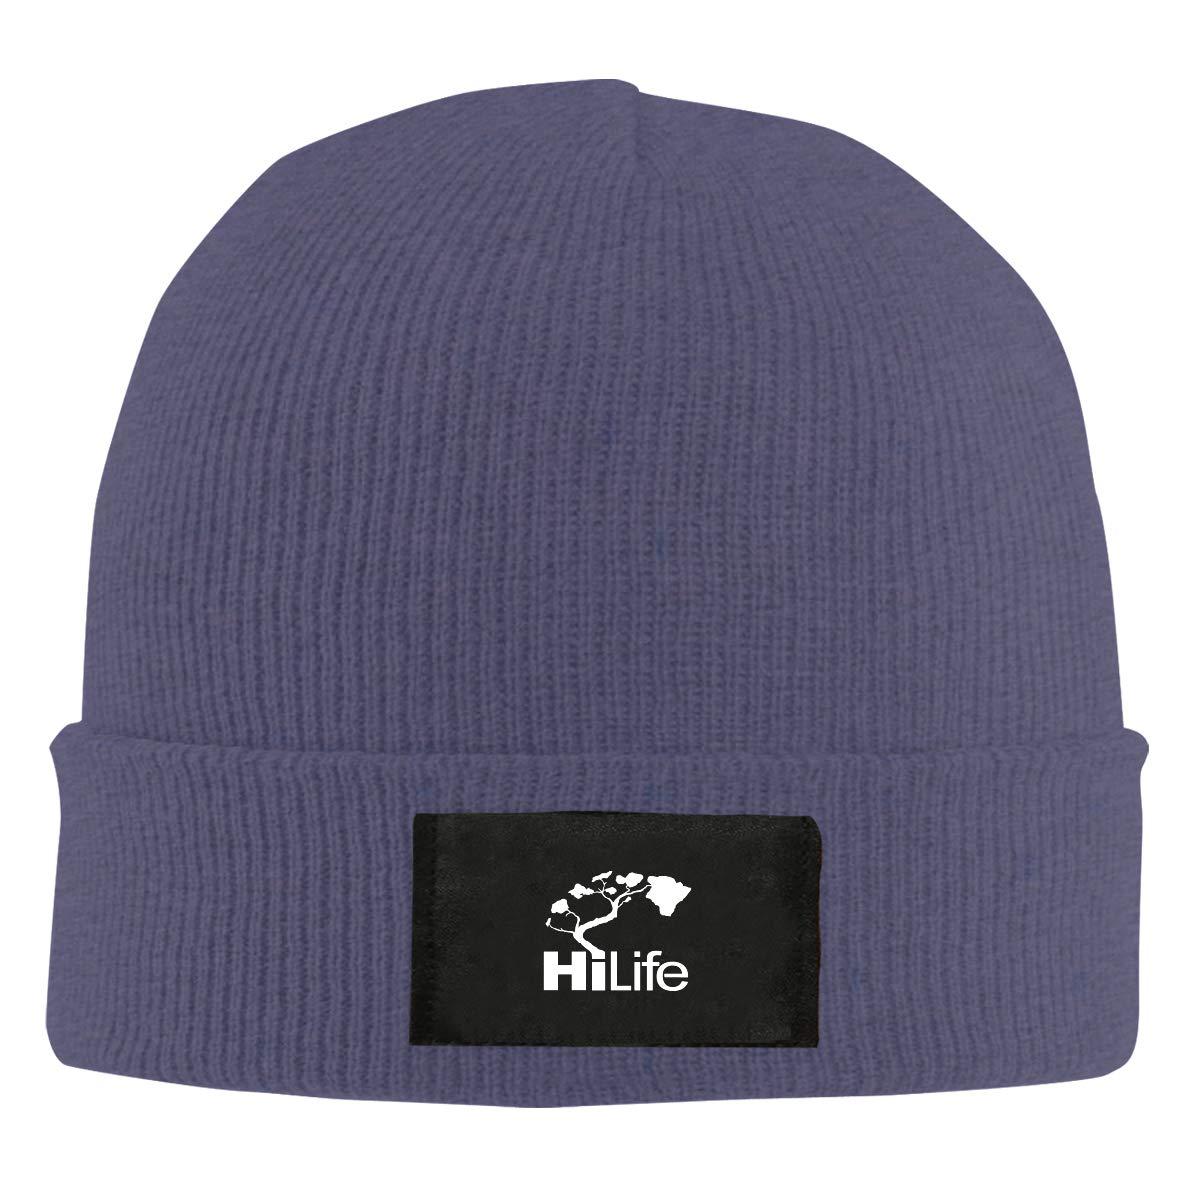 LRHUI Hi Hawaii Winter Knitted Hat Warm Wool Skull Beanie Cap